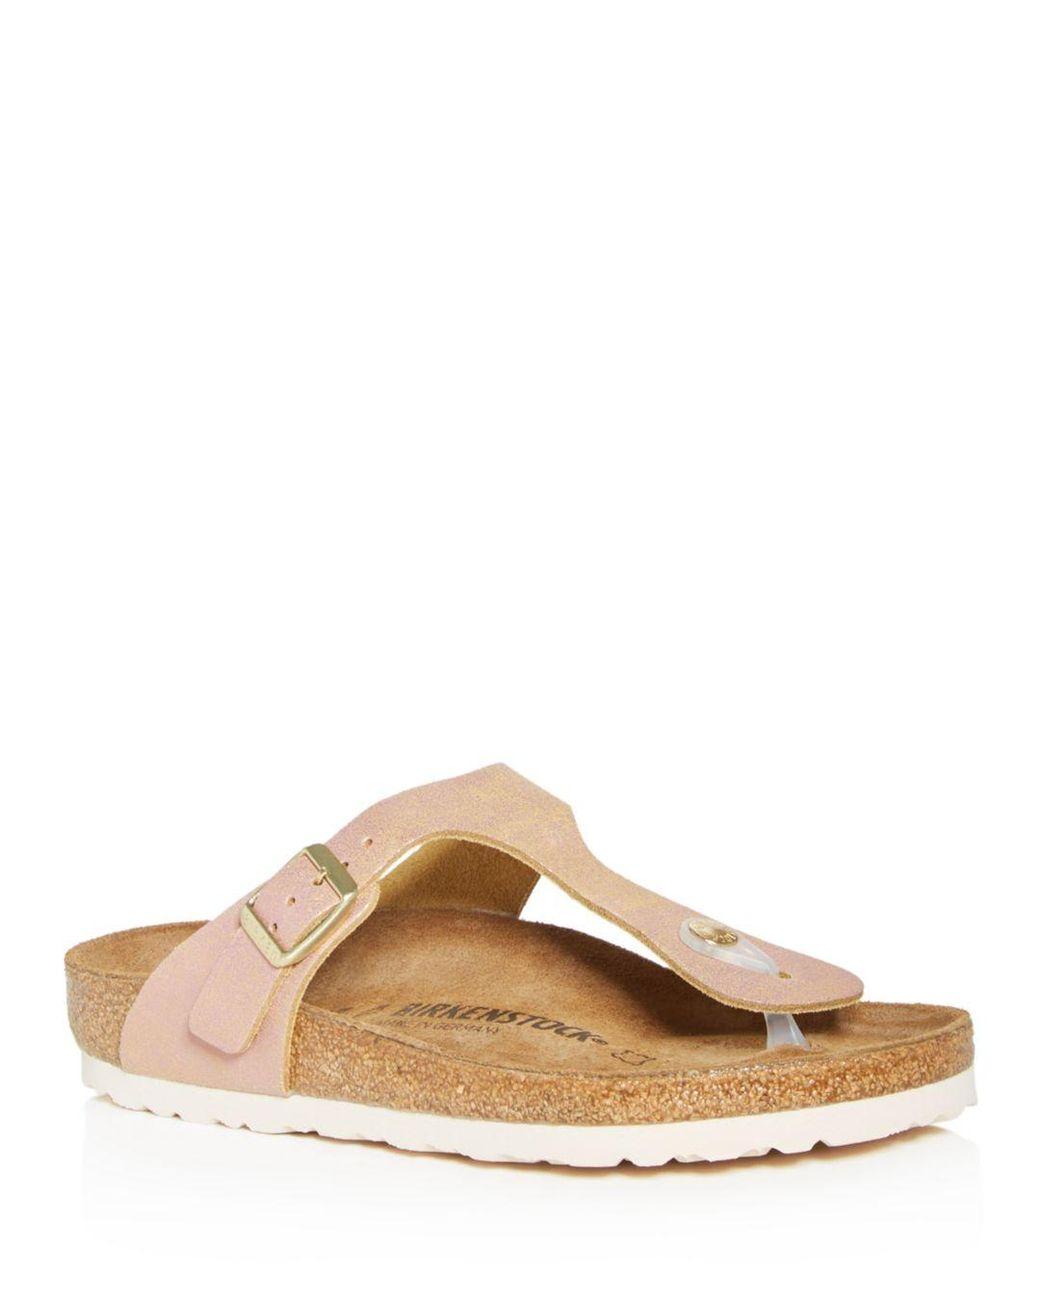 5328021b22ba Birkenstock Women s Gizeh Thong Sandals in Pink - Lyst